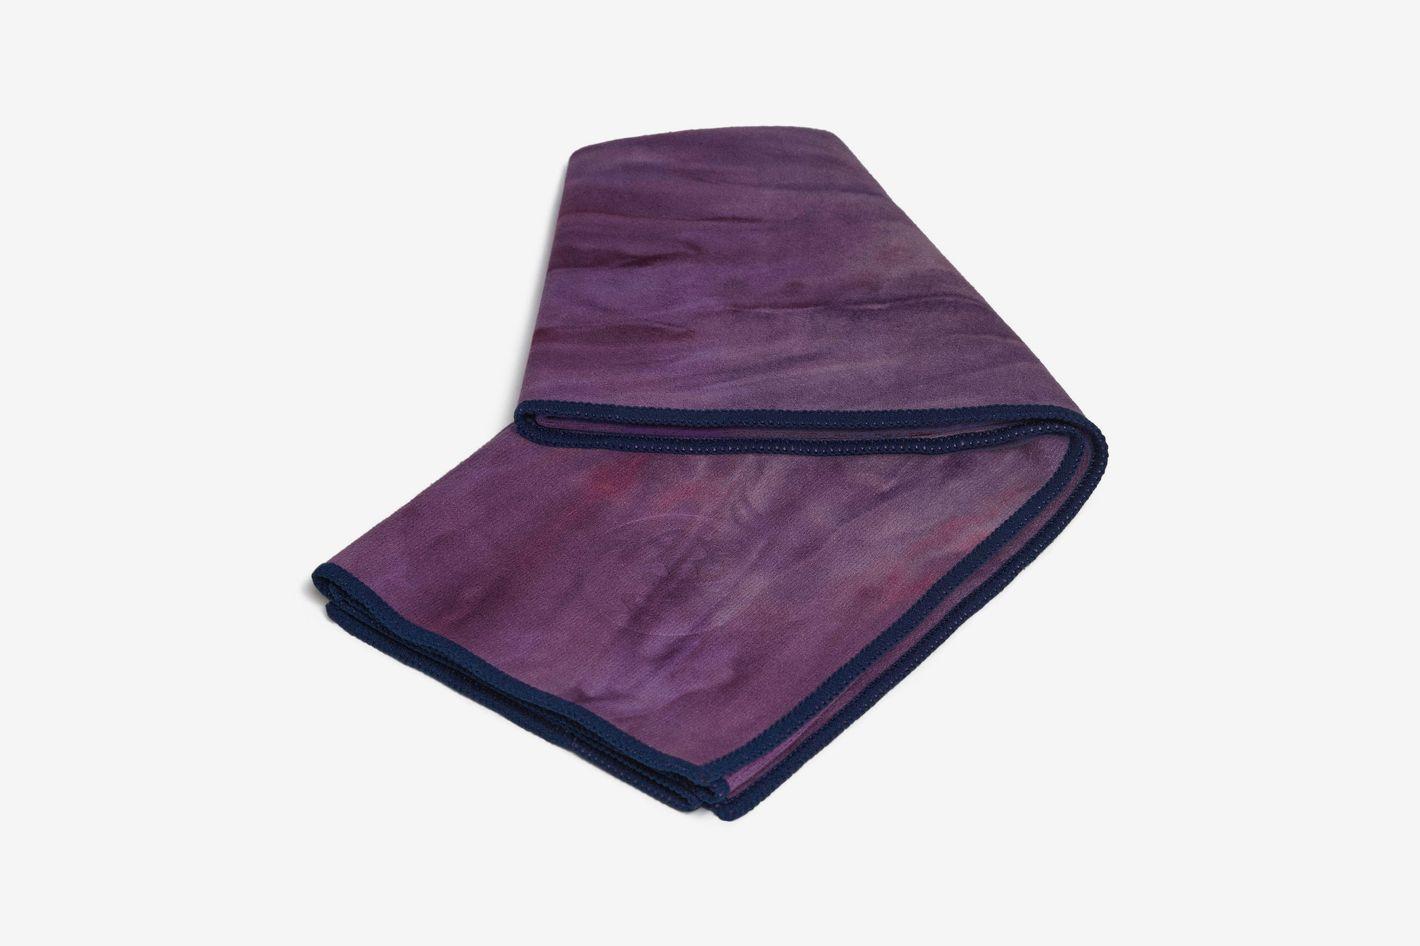 Manduka eQua Indulge Yoga Hand Towel